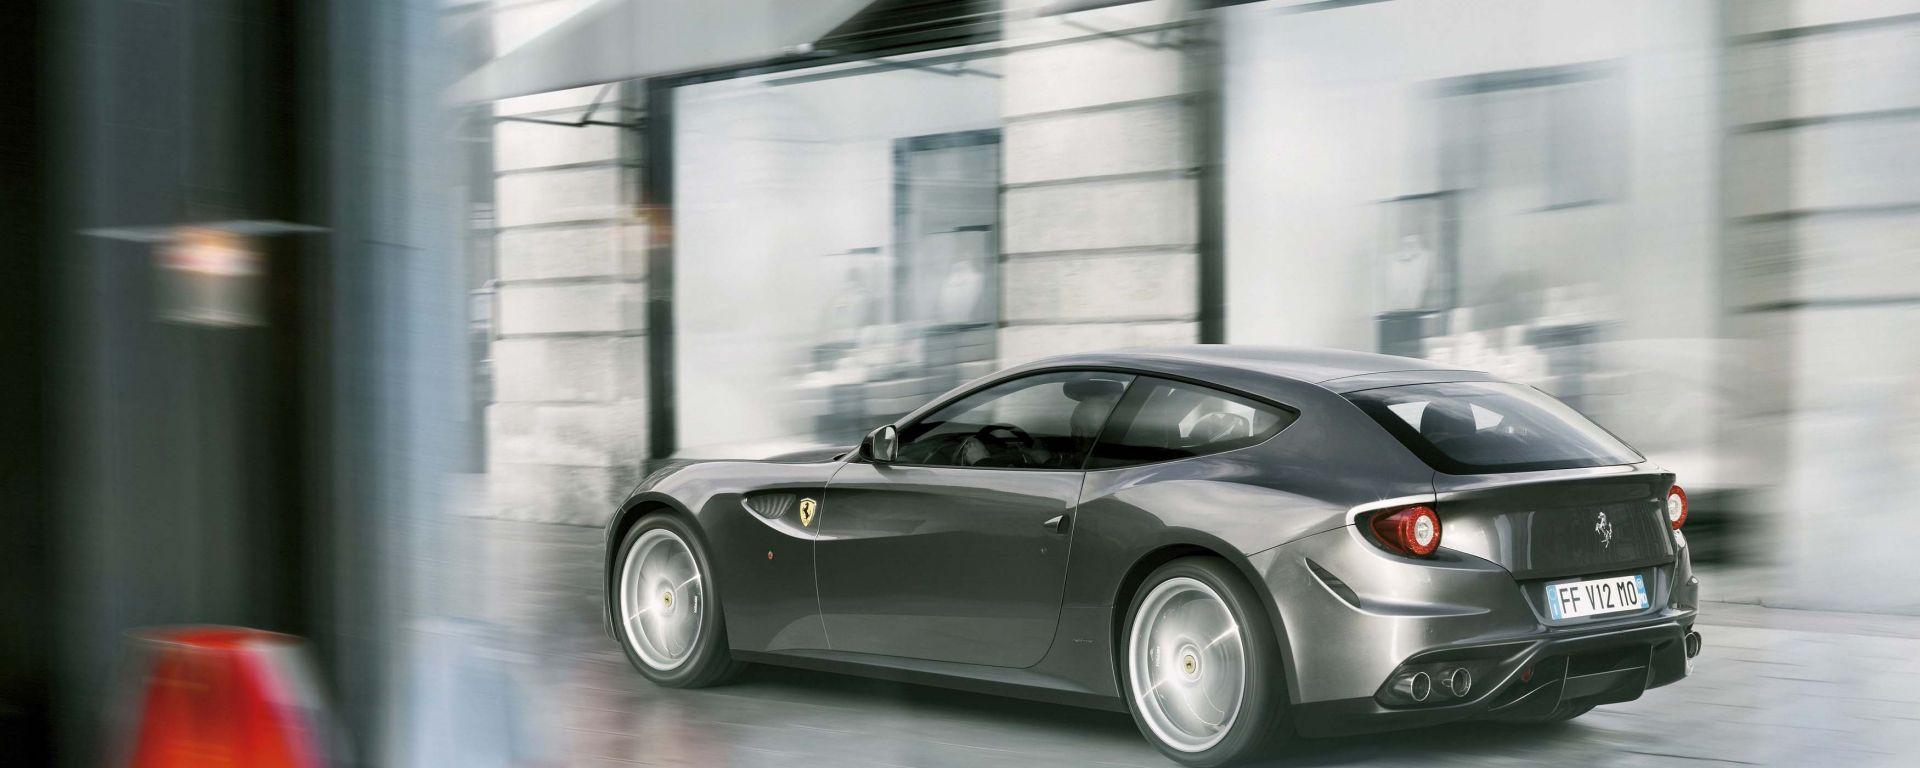 Ferrari FF, 30 nuove immagini in HD